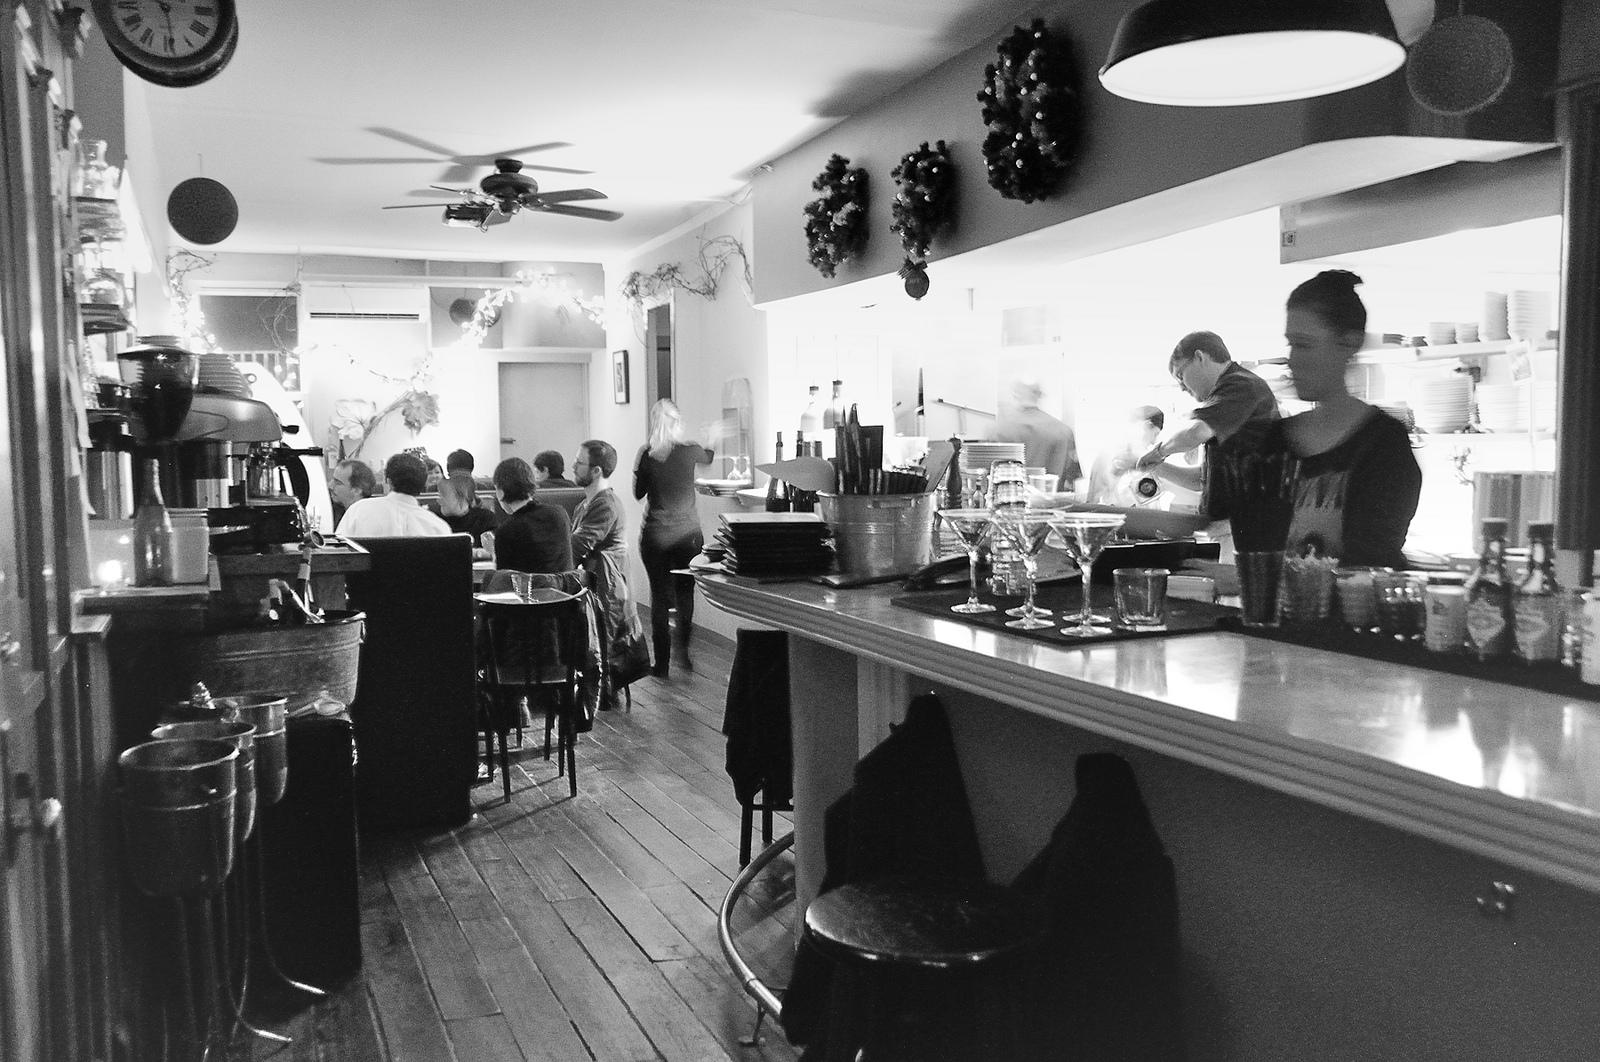 Jovens trabalhando em bar de Williamsburg, Nova York. Foto 41134346@N03 @ Flickr.